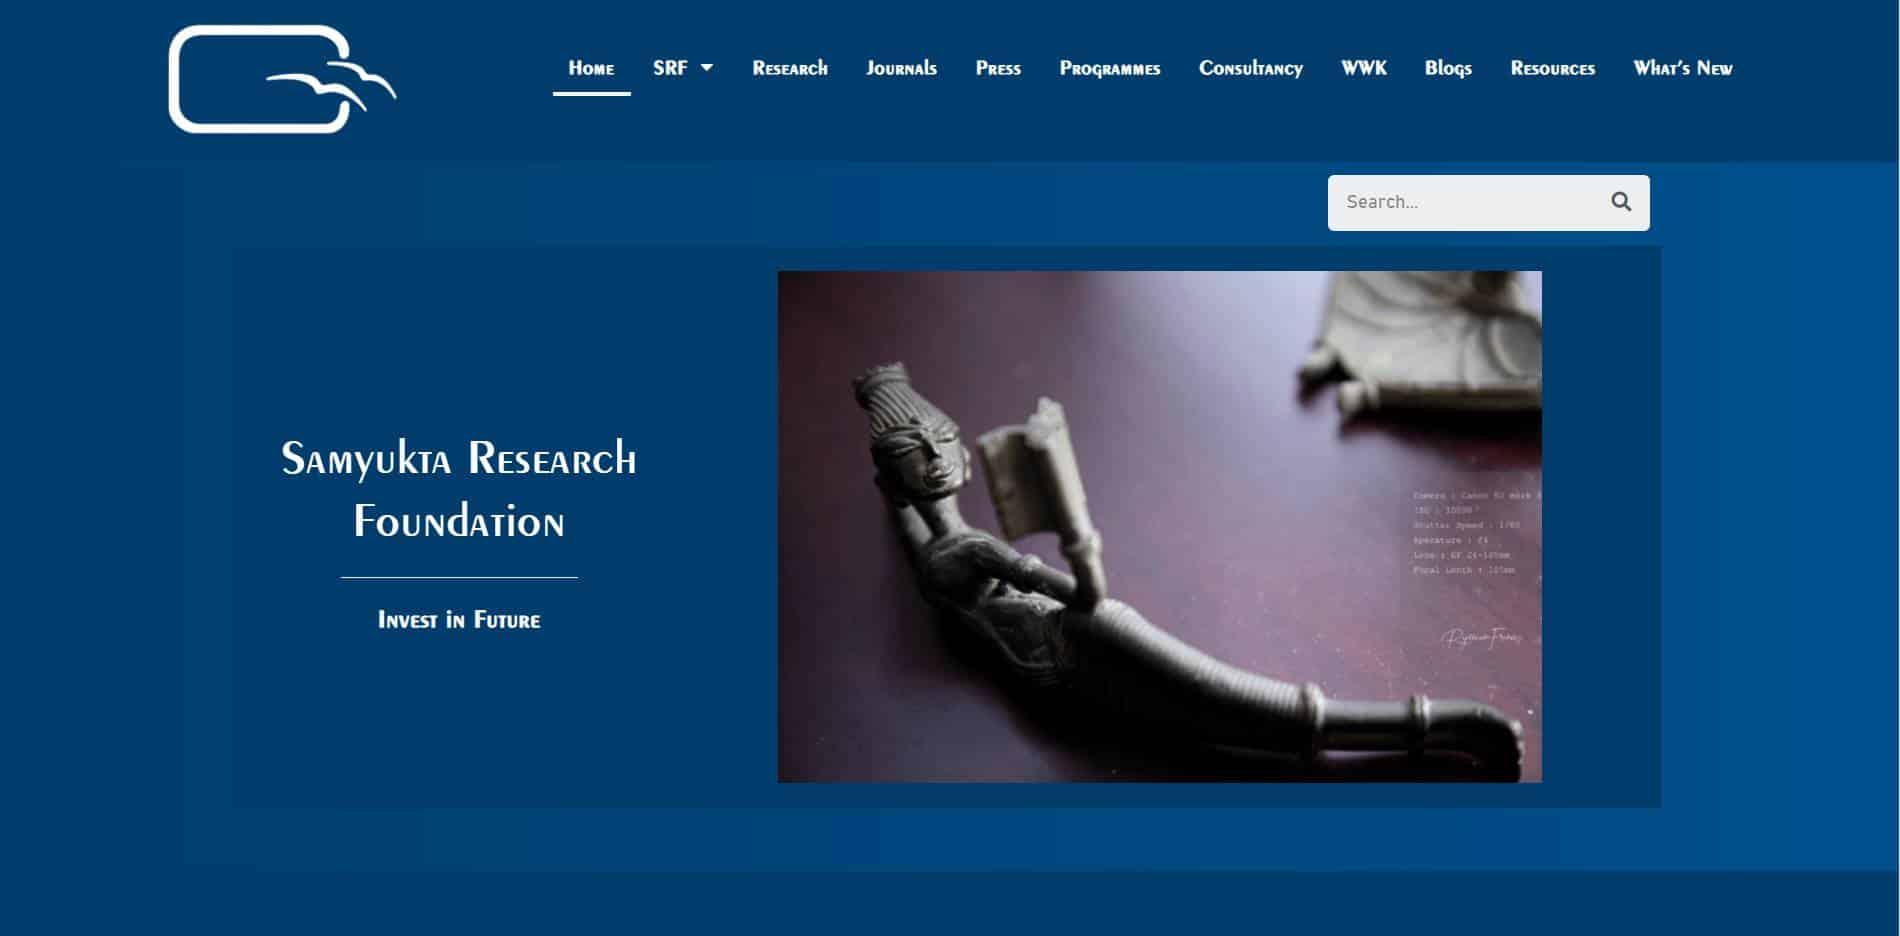 Samyukta Research Foundation